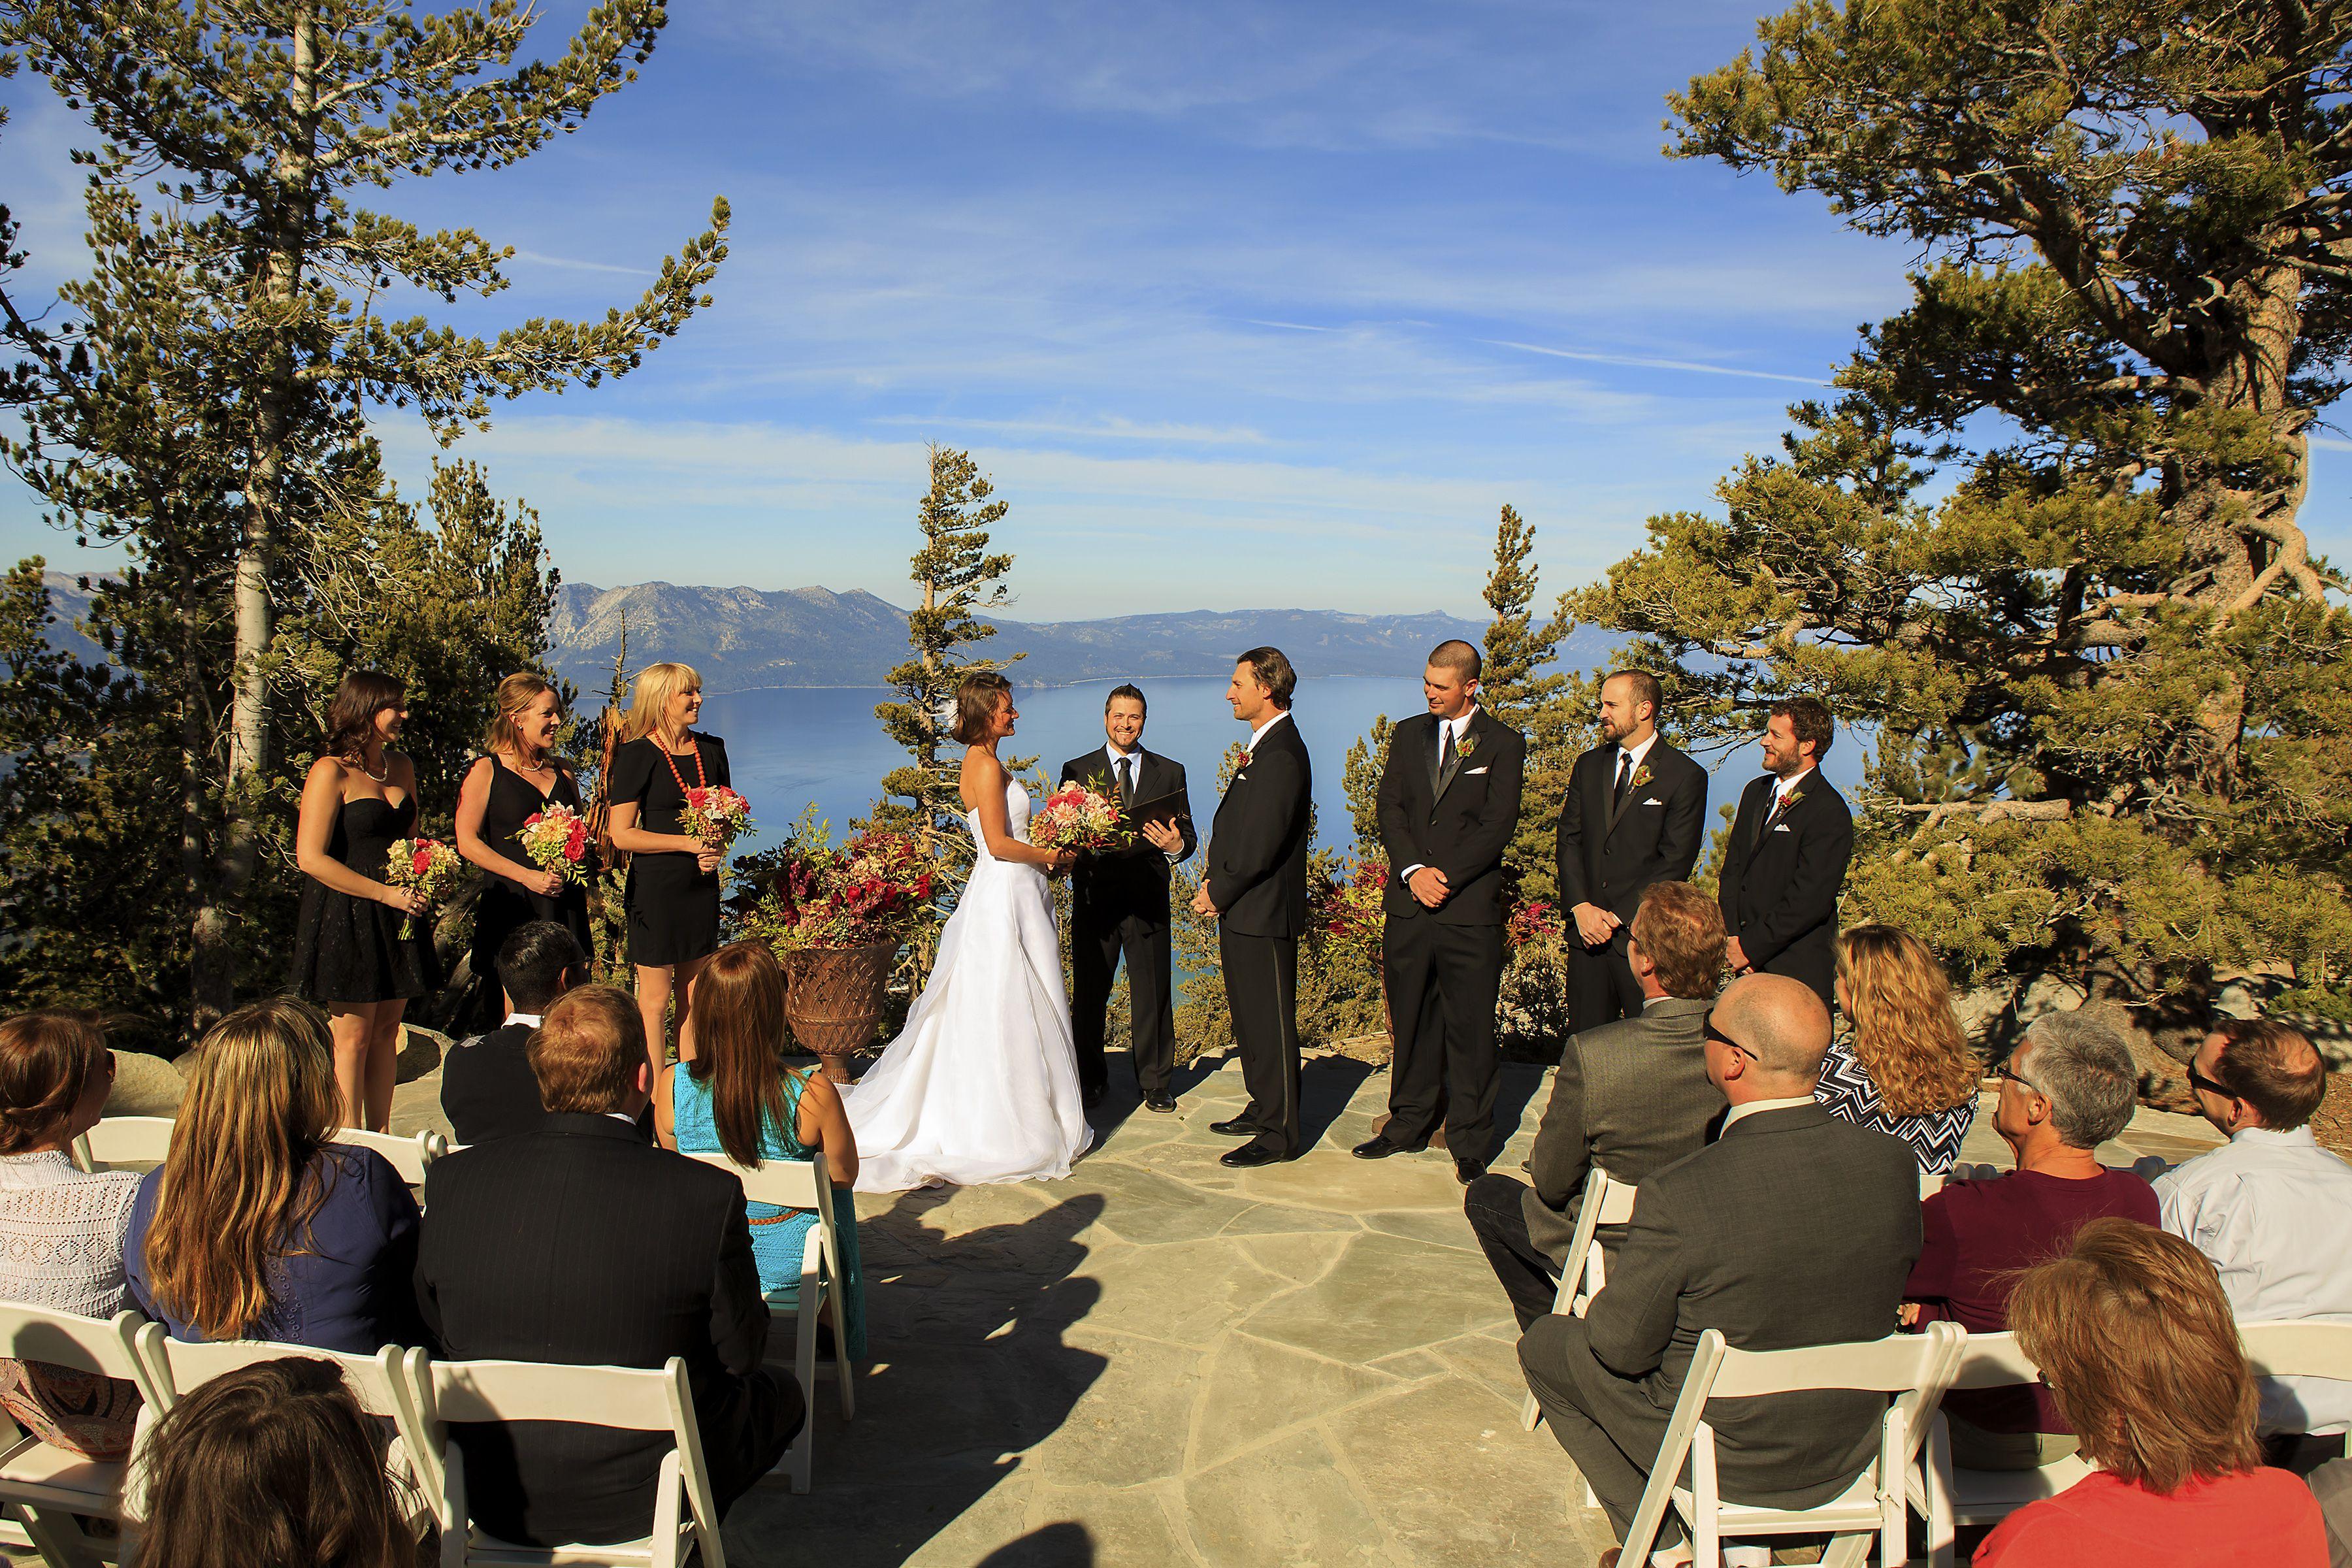 Wedding Ceremony At Mountain Top Location Of Heavenly Gondola Lake Tahoe Wedding Venues Tahoe Wedding Venue Tahoe Wedding